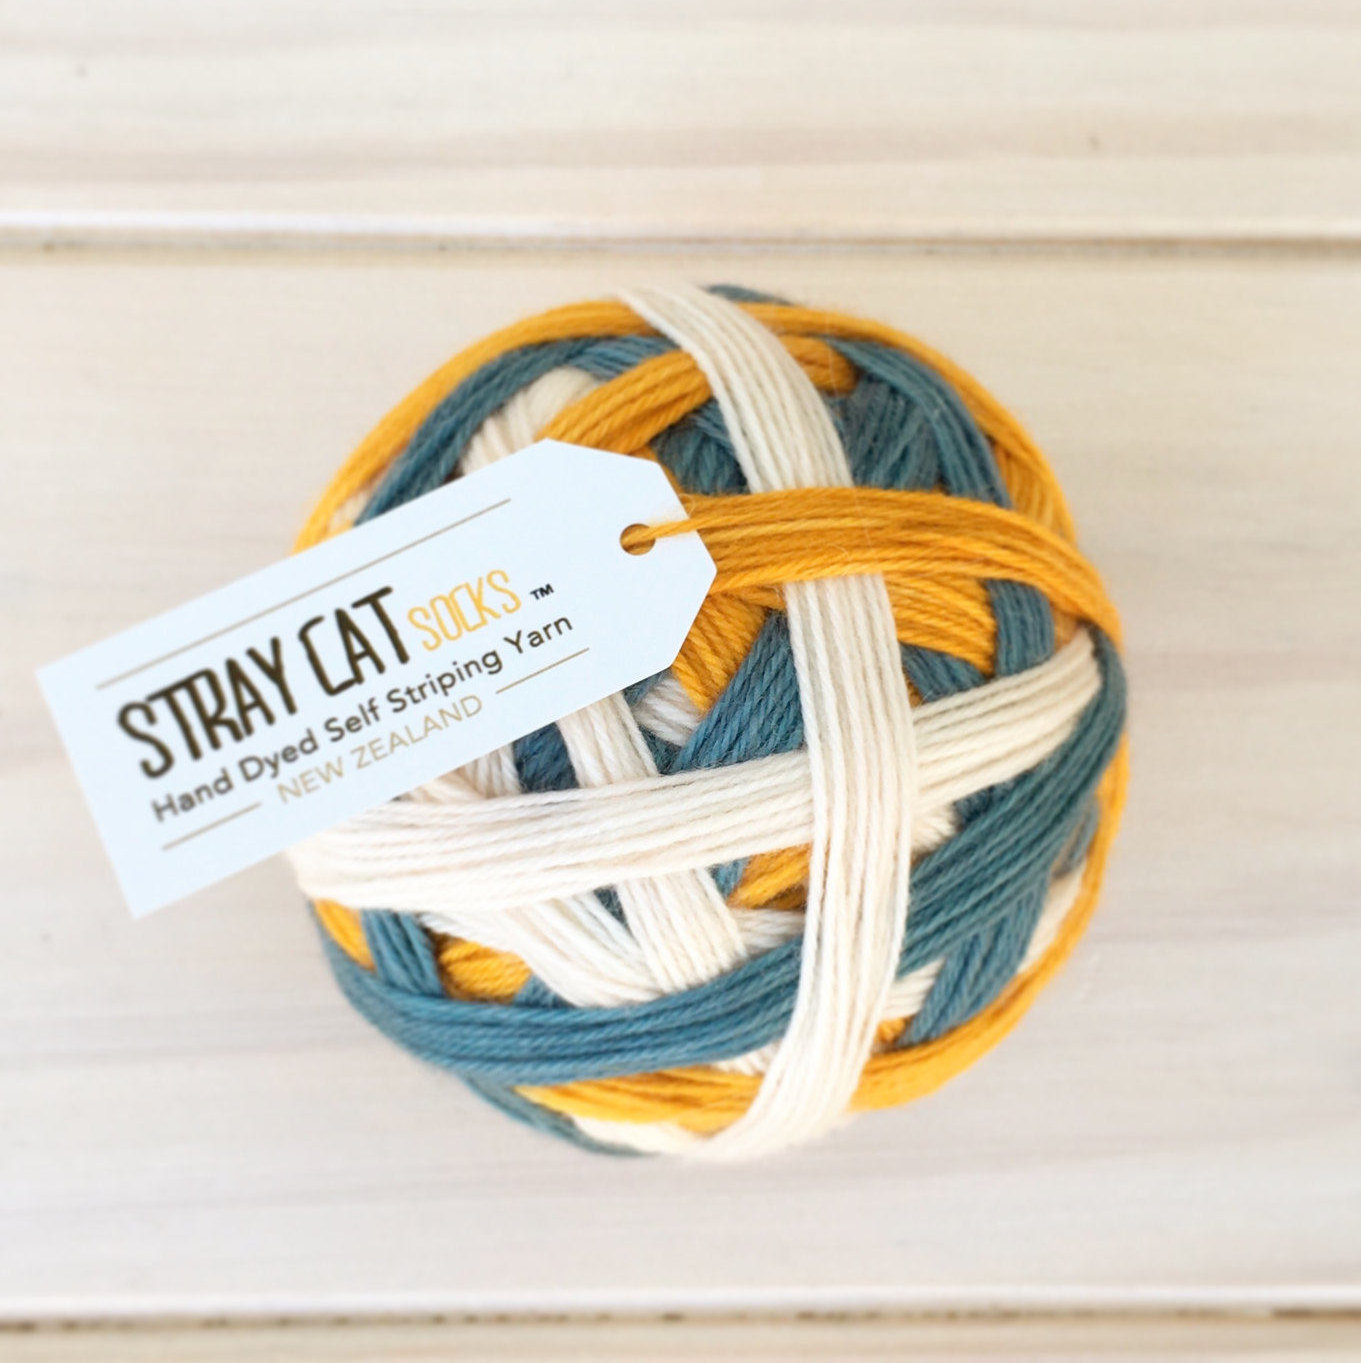 New Sock Yarn rescue cat - vibrant hand dyed self striping sock yarn qypvgiv